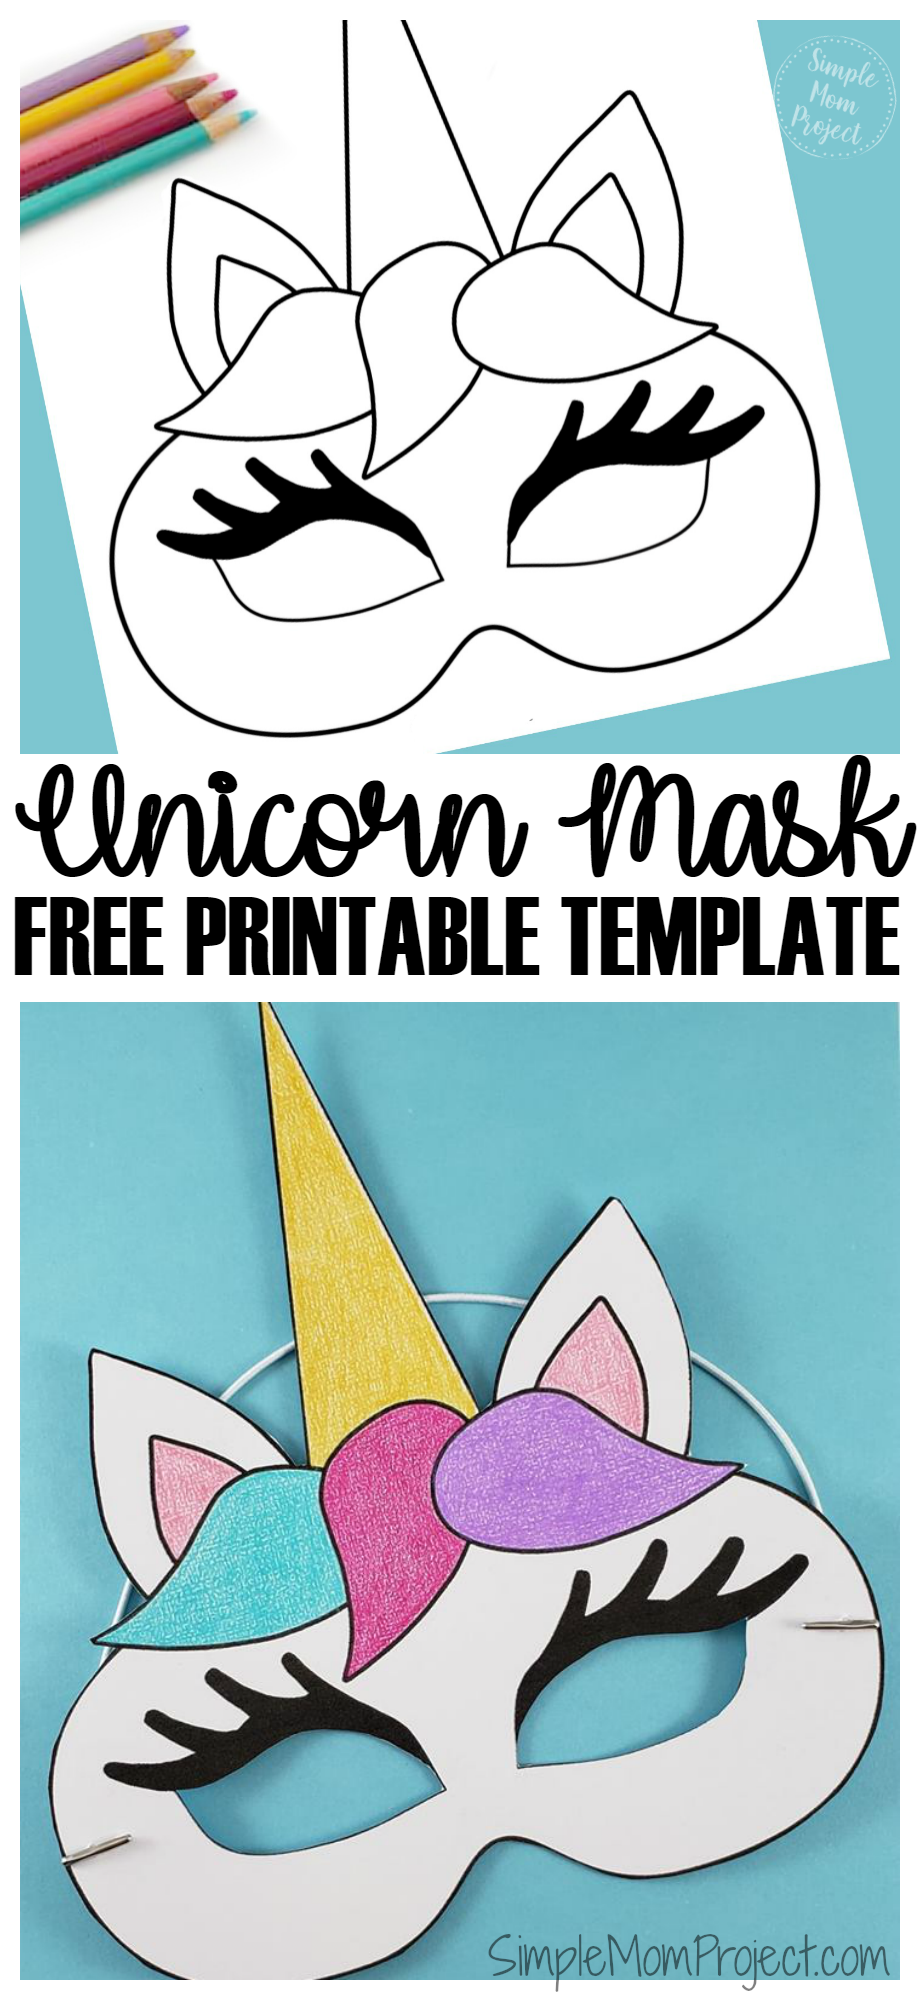 It is an image of Printable Unicorn Mask inside black